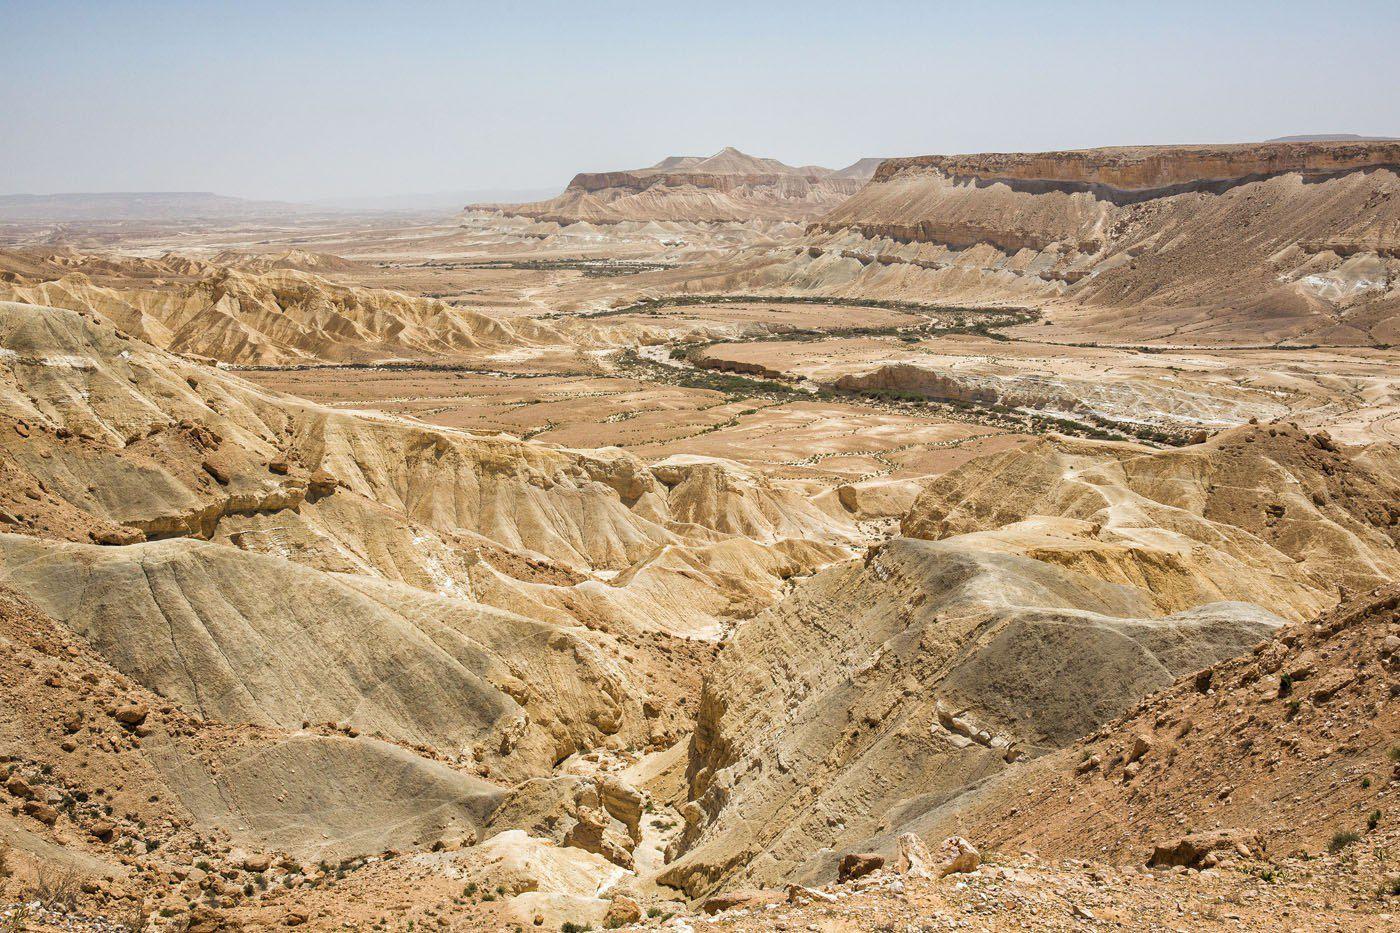 dirt hills in the negev desert, israel